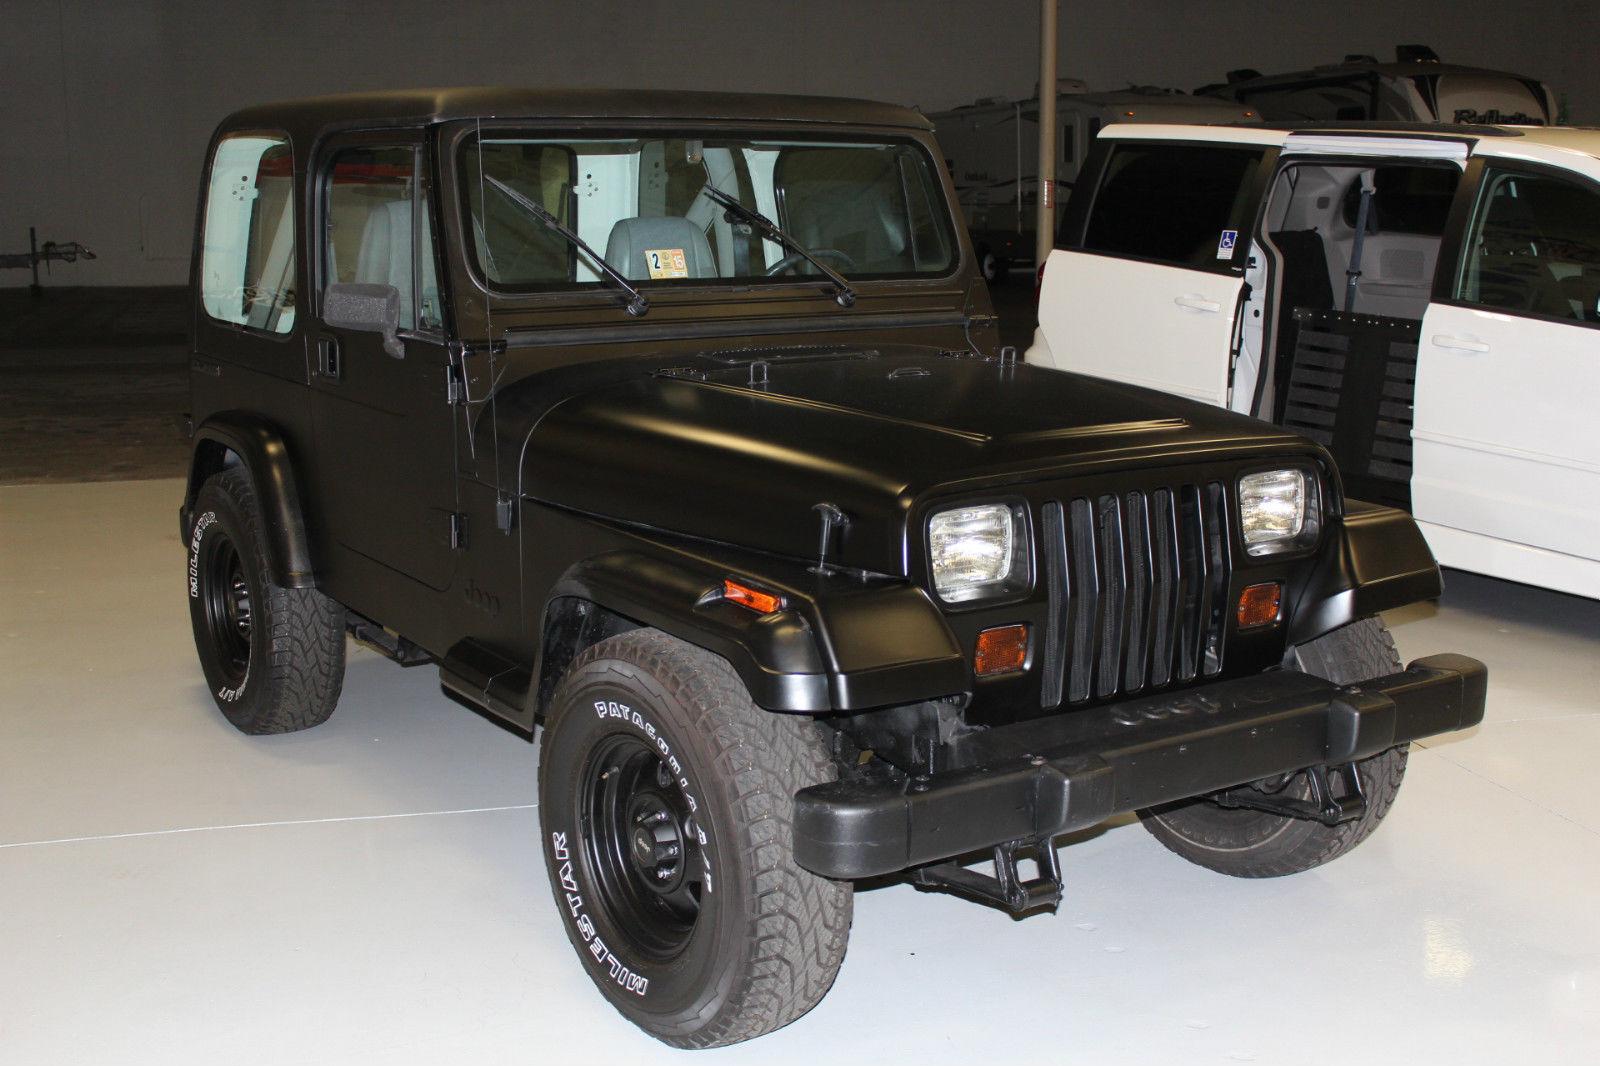 1990 jeep wrangler base sport utility 2 door 4 2l black hardtop new tires belts classic jeep. Black Bedroom Furniture Sets. Home Design Ideas